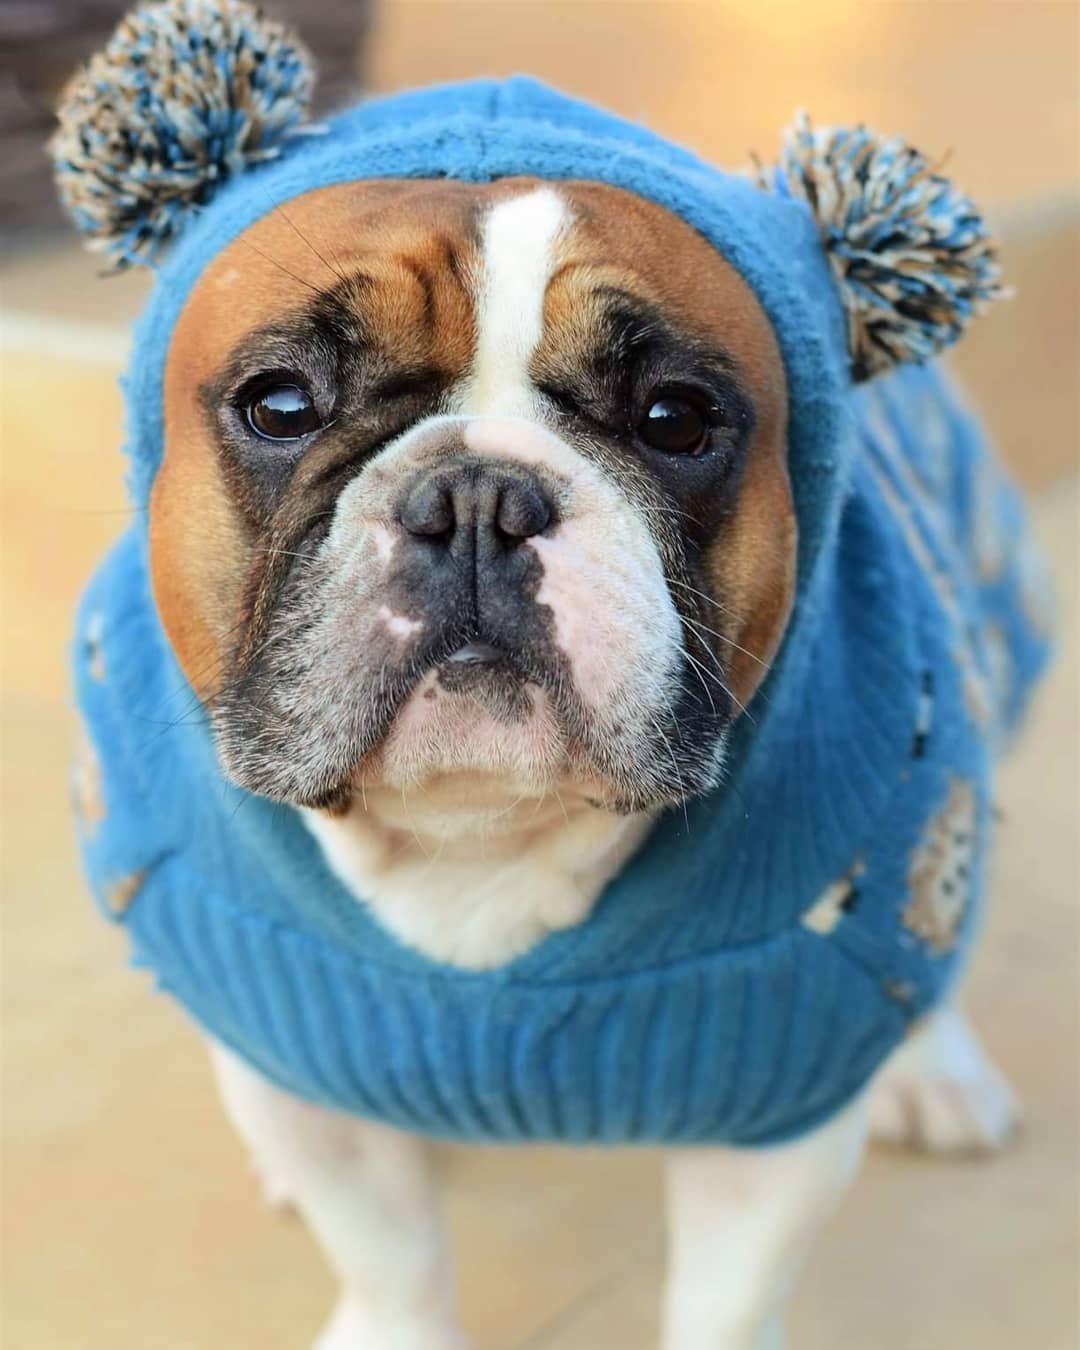 Home Dog Grooming Tips Pekna Som Panicka Ddomika Mi Doniesla